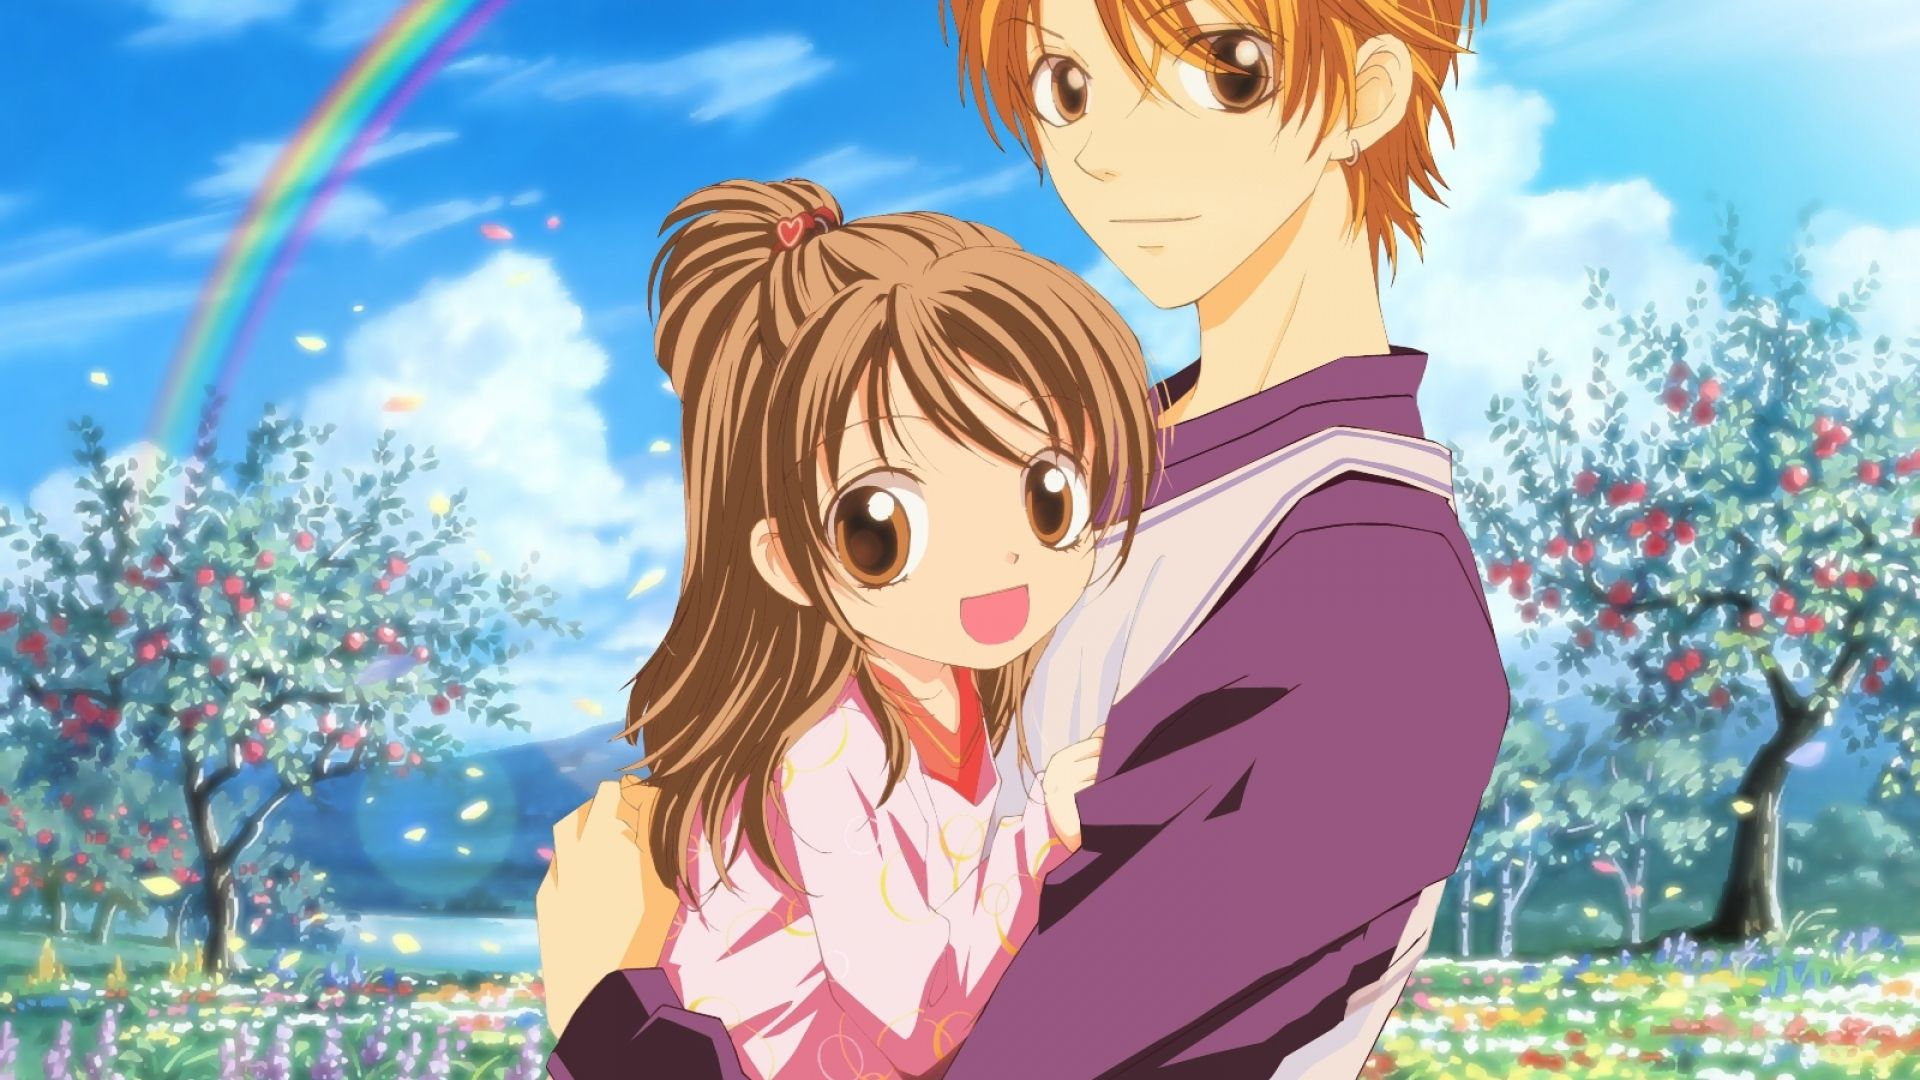 Download Wallpaper 10x10 aishiteruze baby, boy, girl, hug, sky